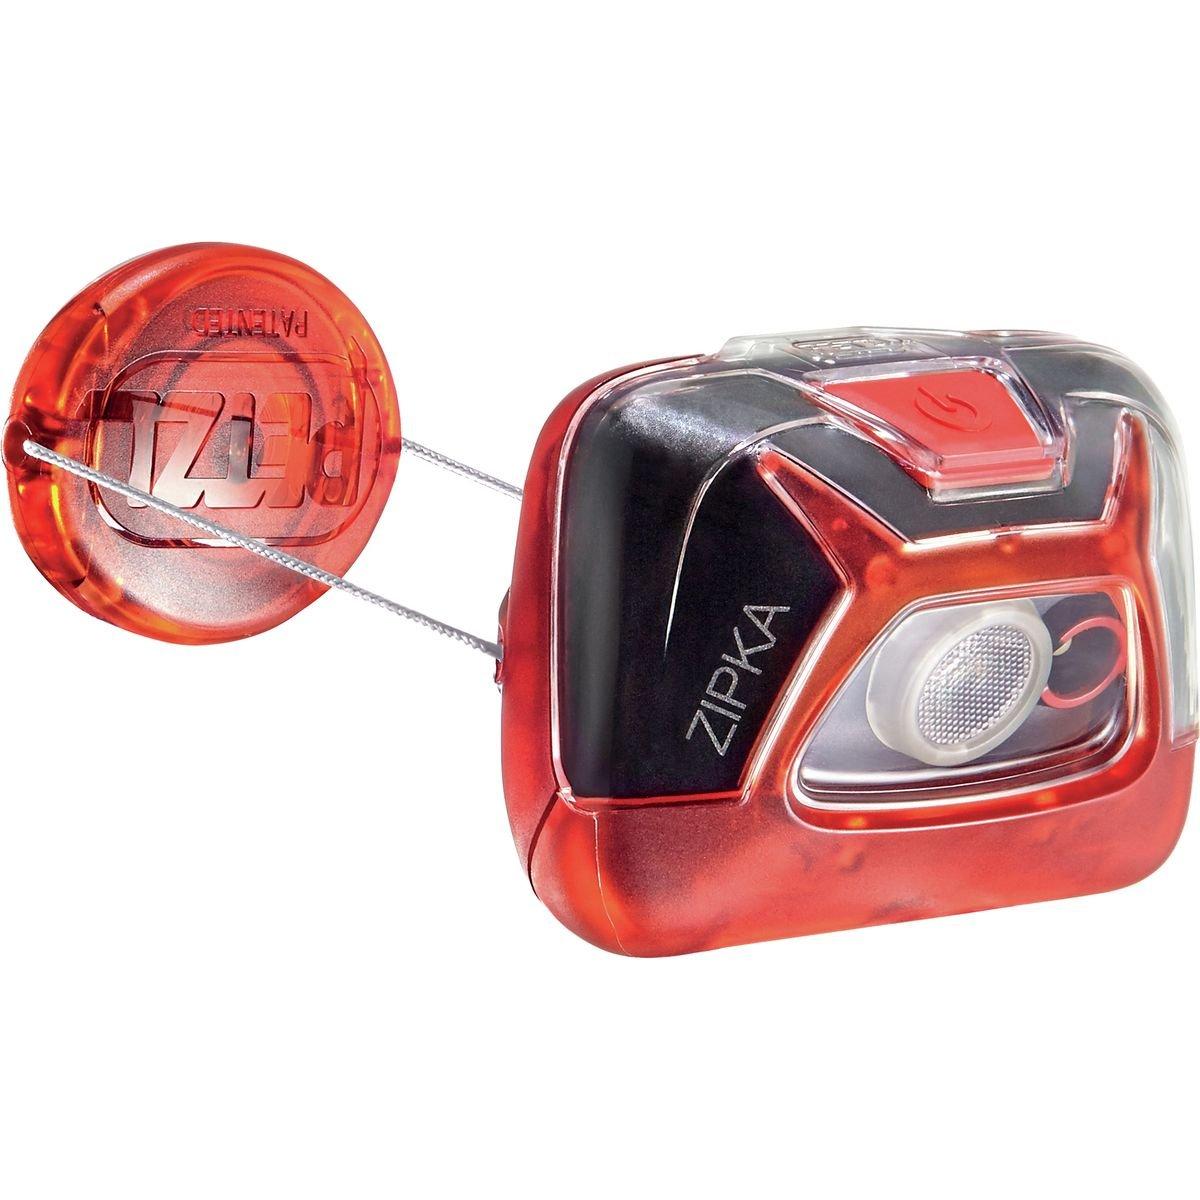 Petzl Zipka Headlamp Petzl Zipka Headlamp - Black One Size E93ABA